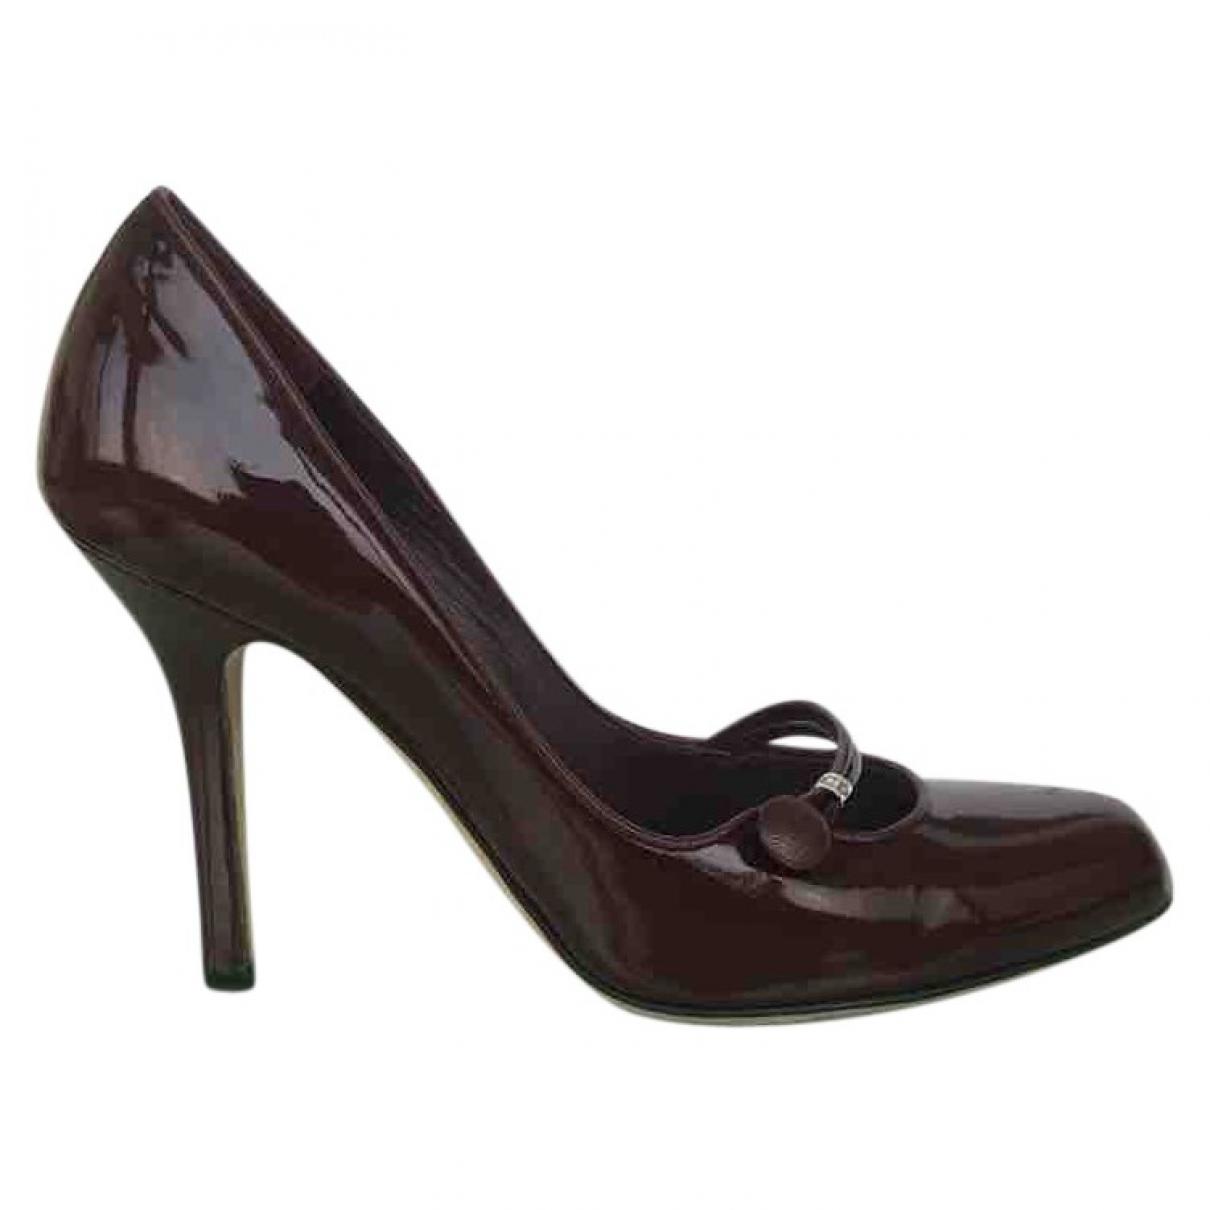 Dior \N Burgundy Patent leather Heels for Women 36 EU